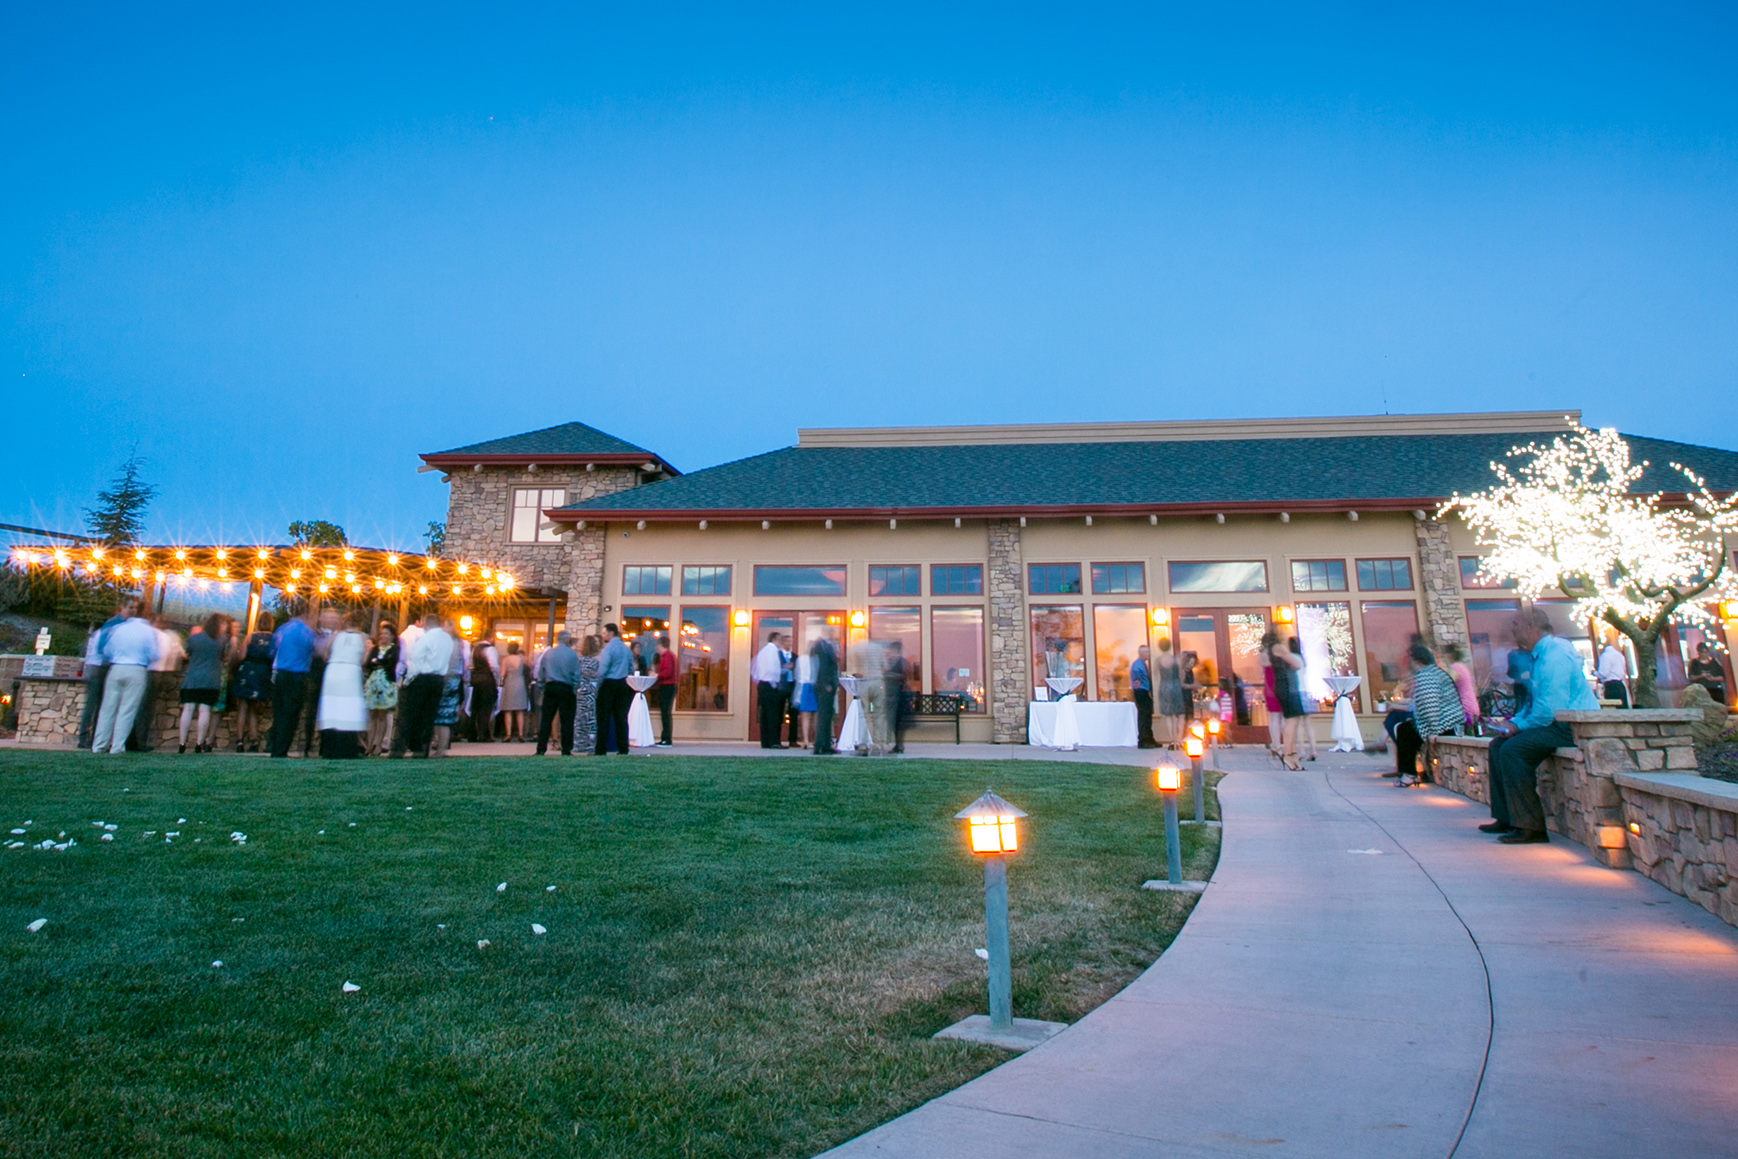 Cocktail Hour on the spacious patio - Boulder Ridge - Los Gatos, California - San Jose, California - Santa Clara County - Wedgewood Weddings